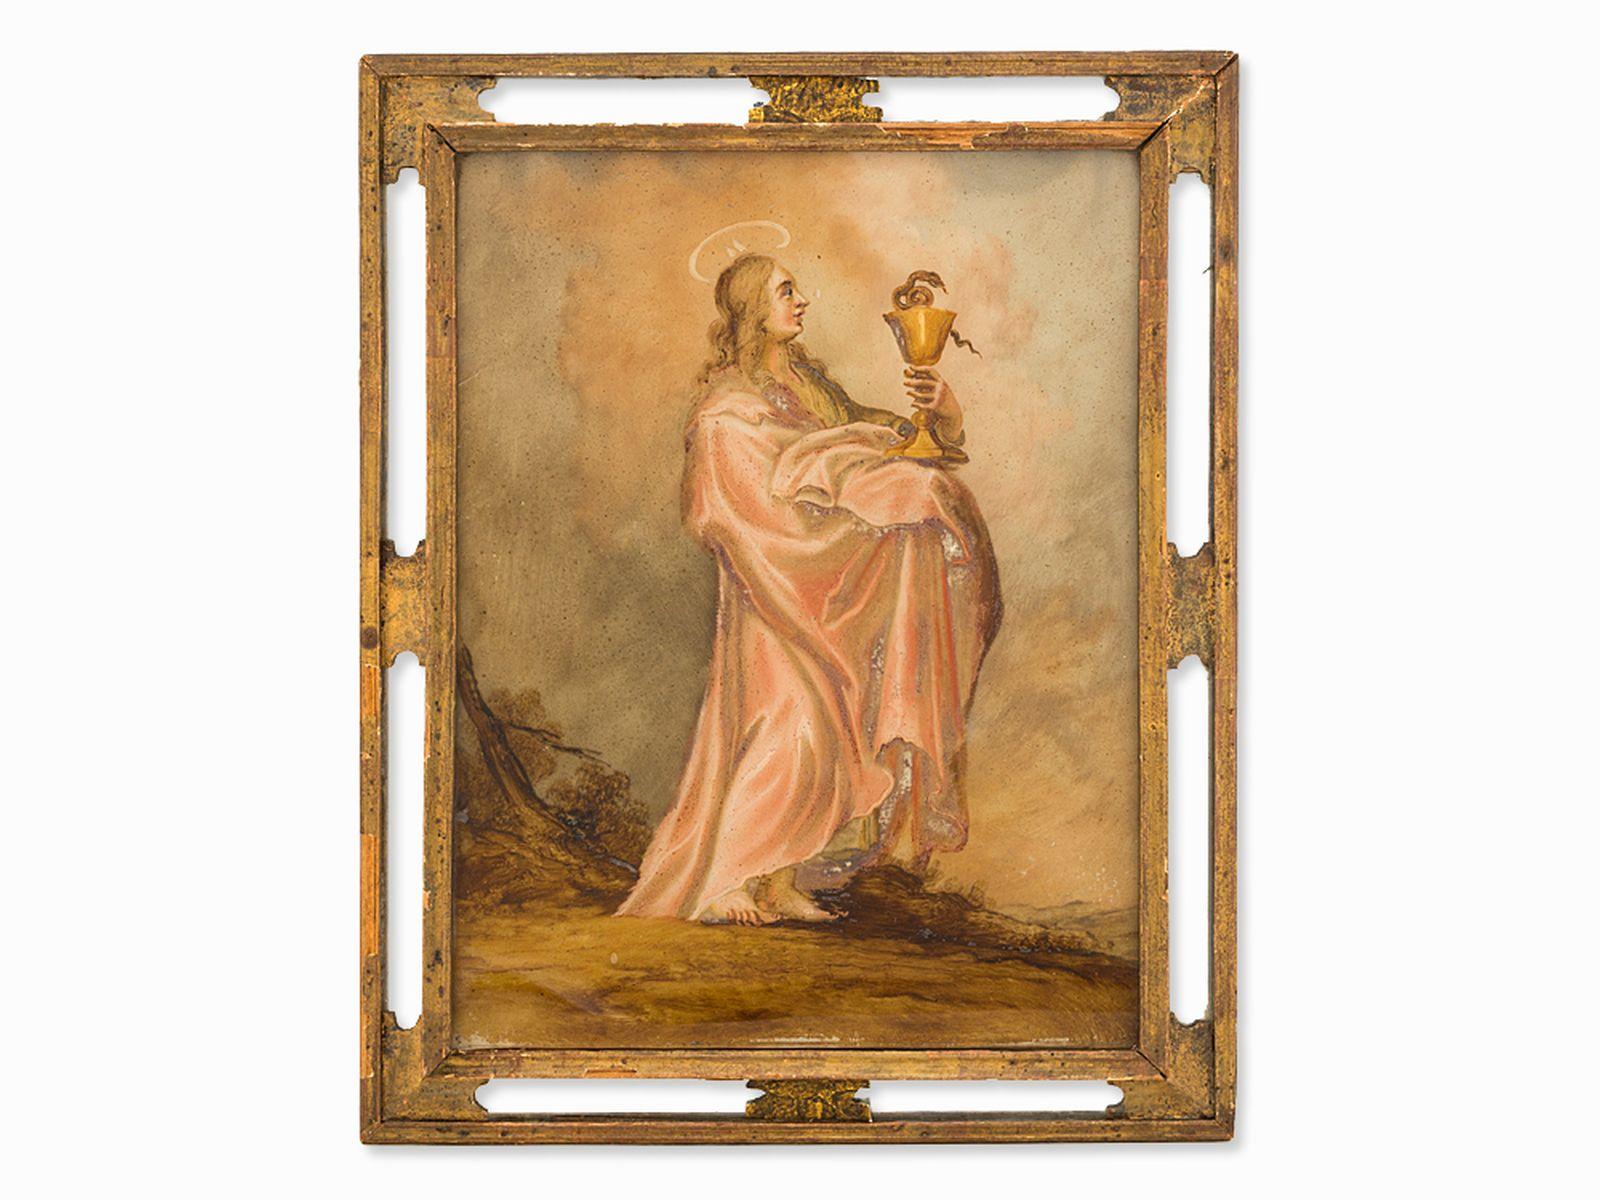 "#71 The Evangelist John reverse glass painting, Italy, 18th century | ""Der Evangelist Johannes"" Hinterglasmalerei, Italien, 18. Jh. Image"